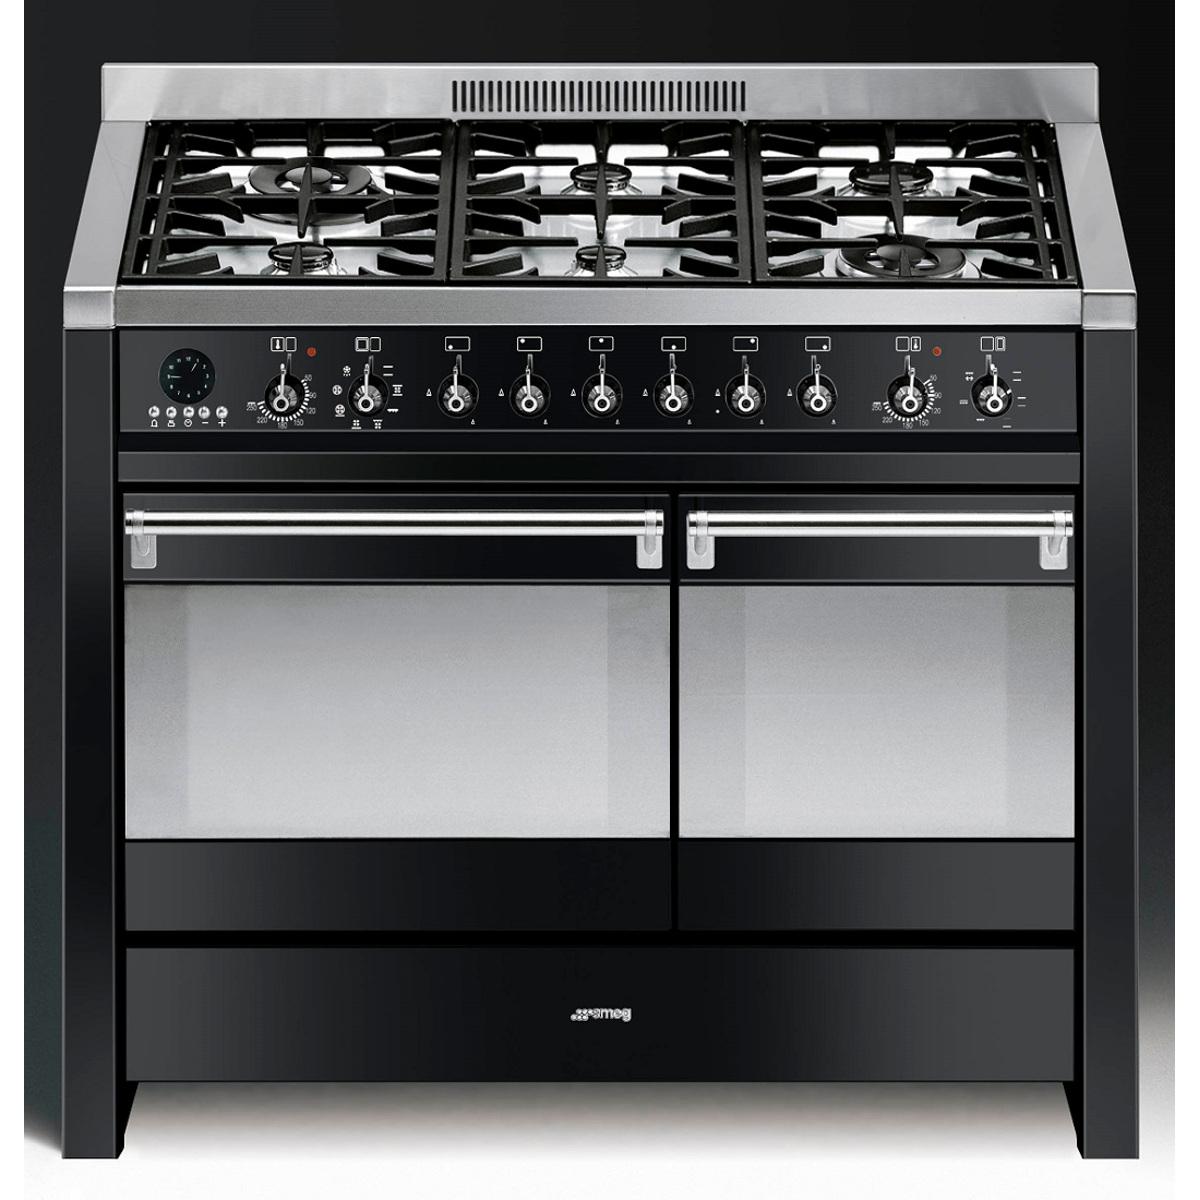 Smeg A2BL-8 100cm Opera Dual Fuel Range Cooker